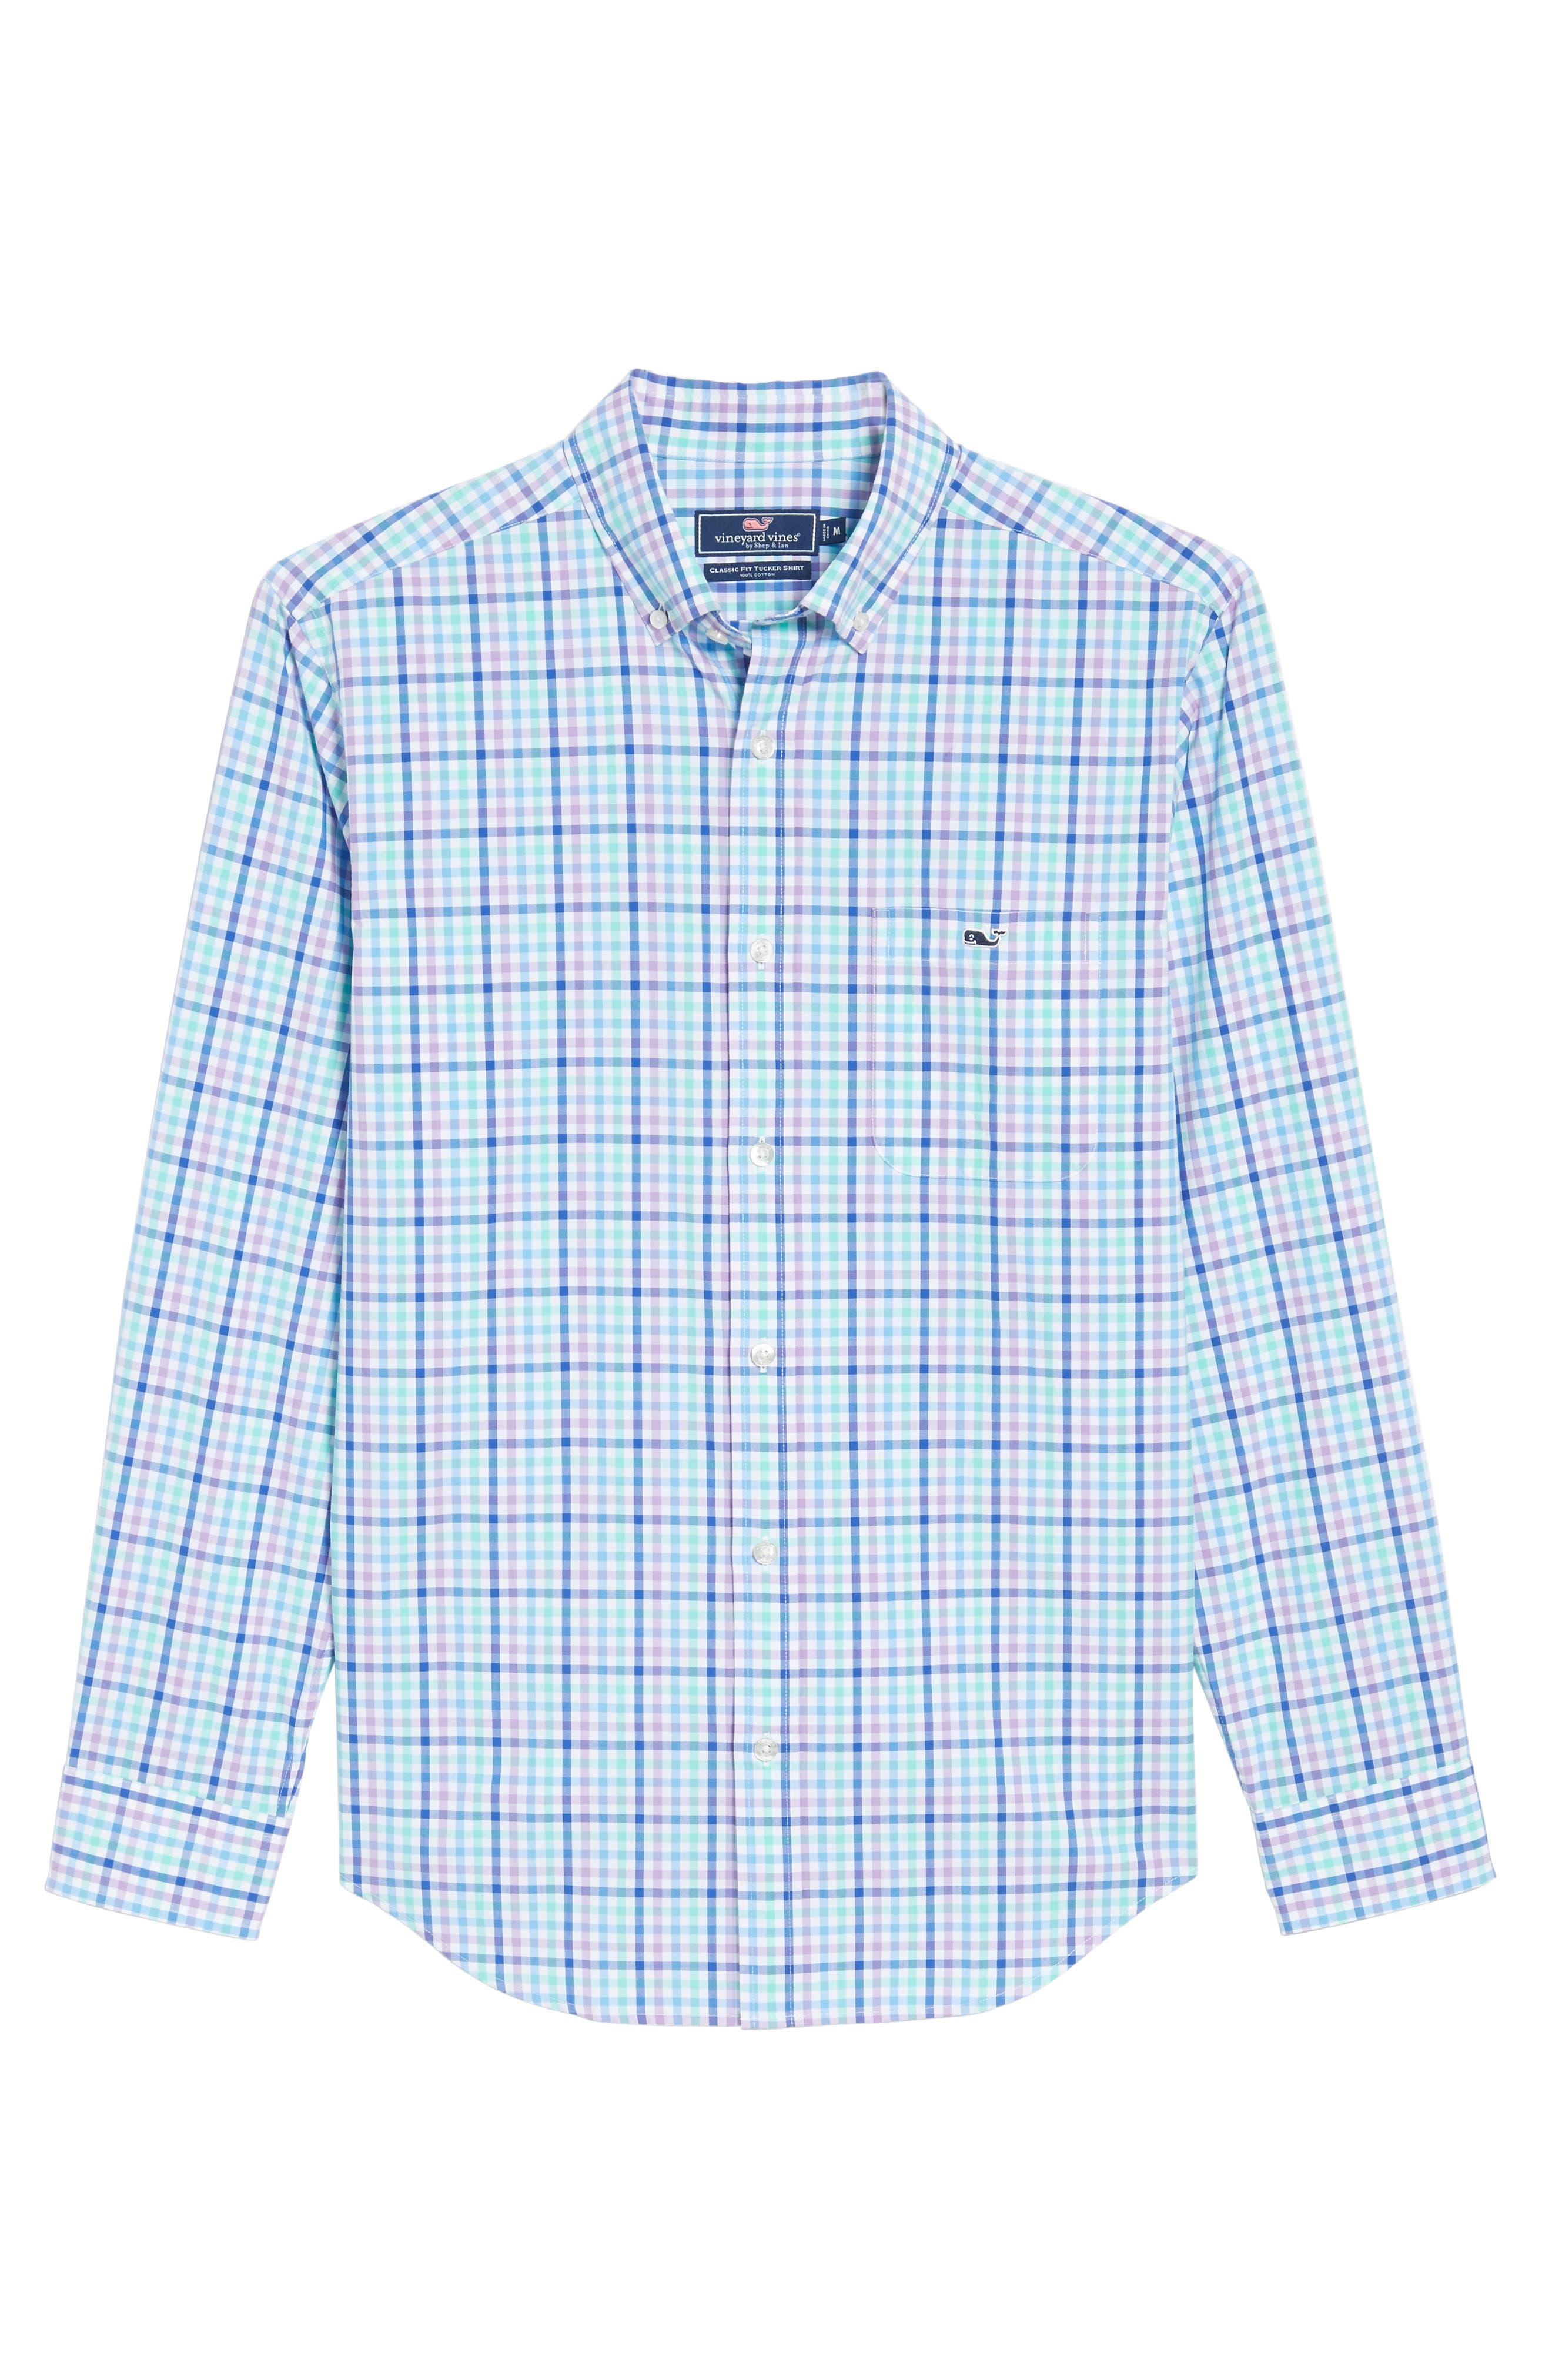 VINEYARD VINES,                             Tucker Gaspar Classic Fit Gingham Sport Shirt,                             Alternate thumbnail 6, color,                             359